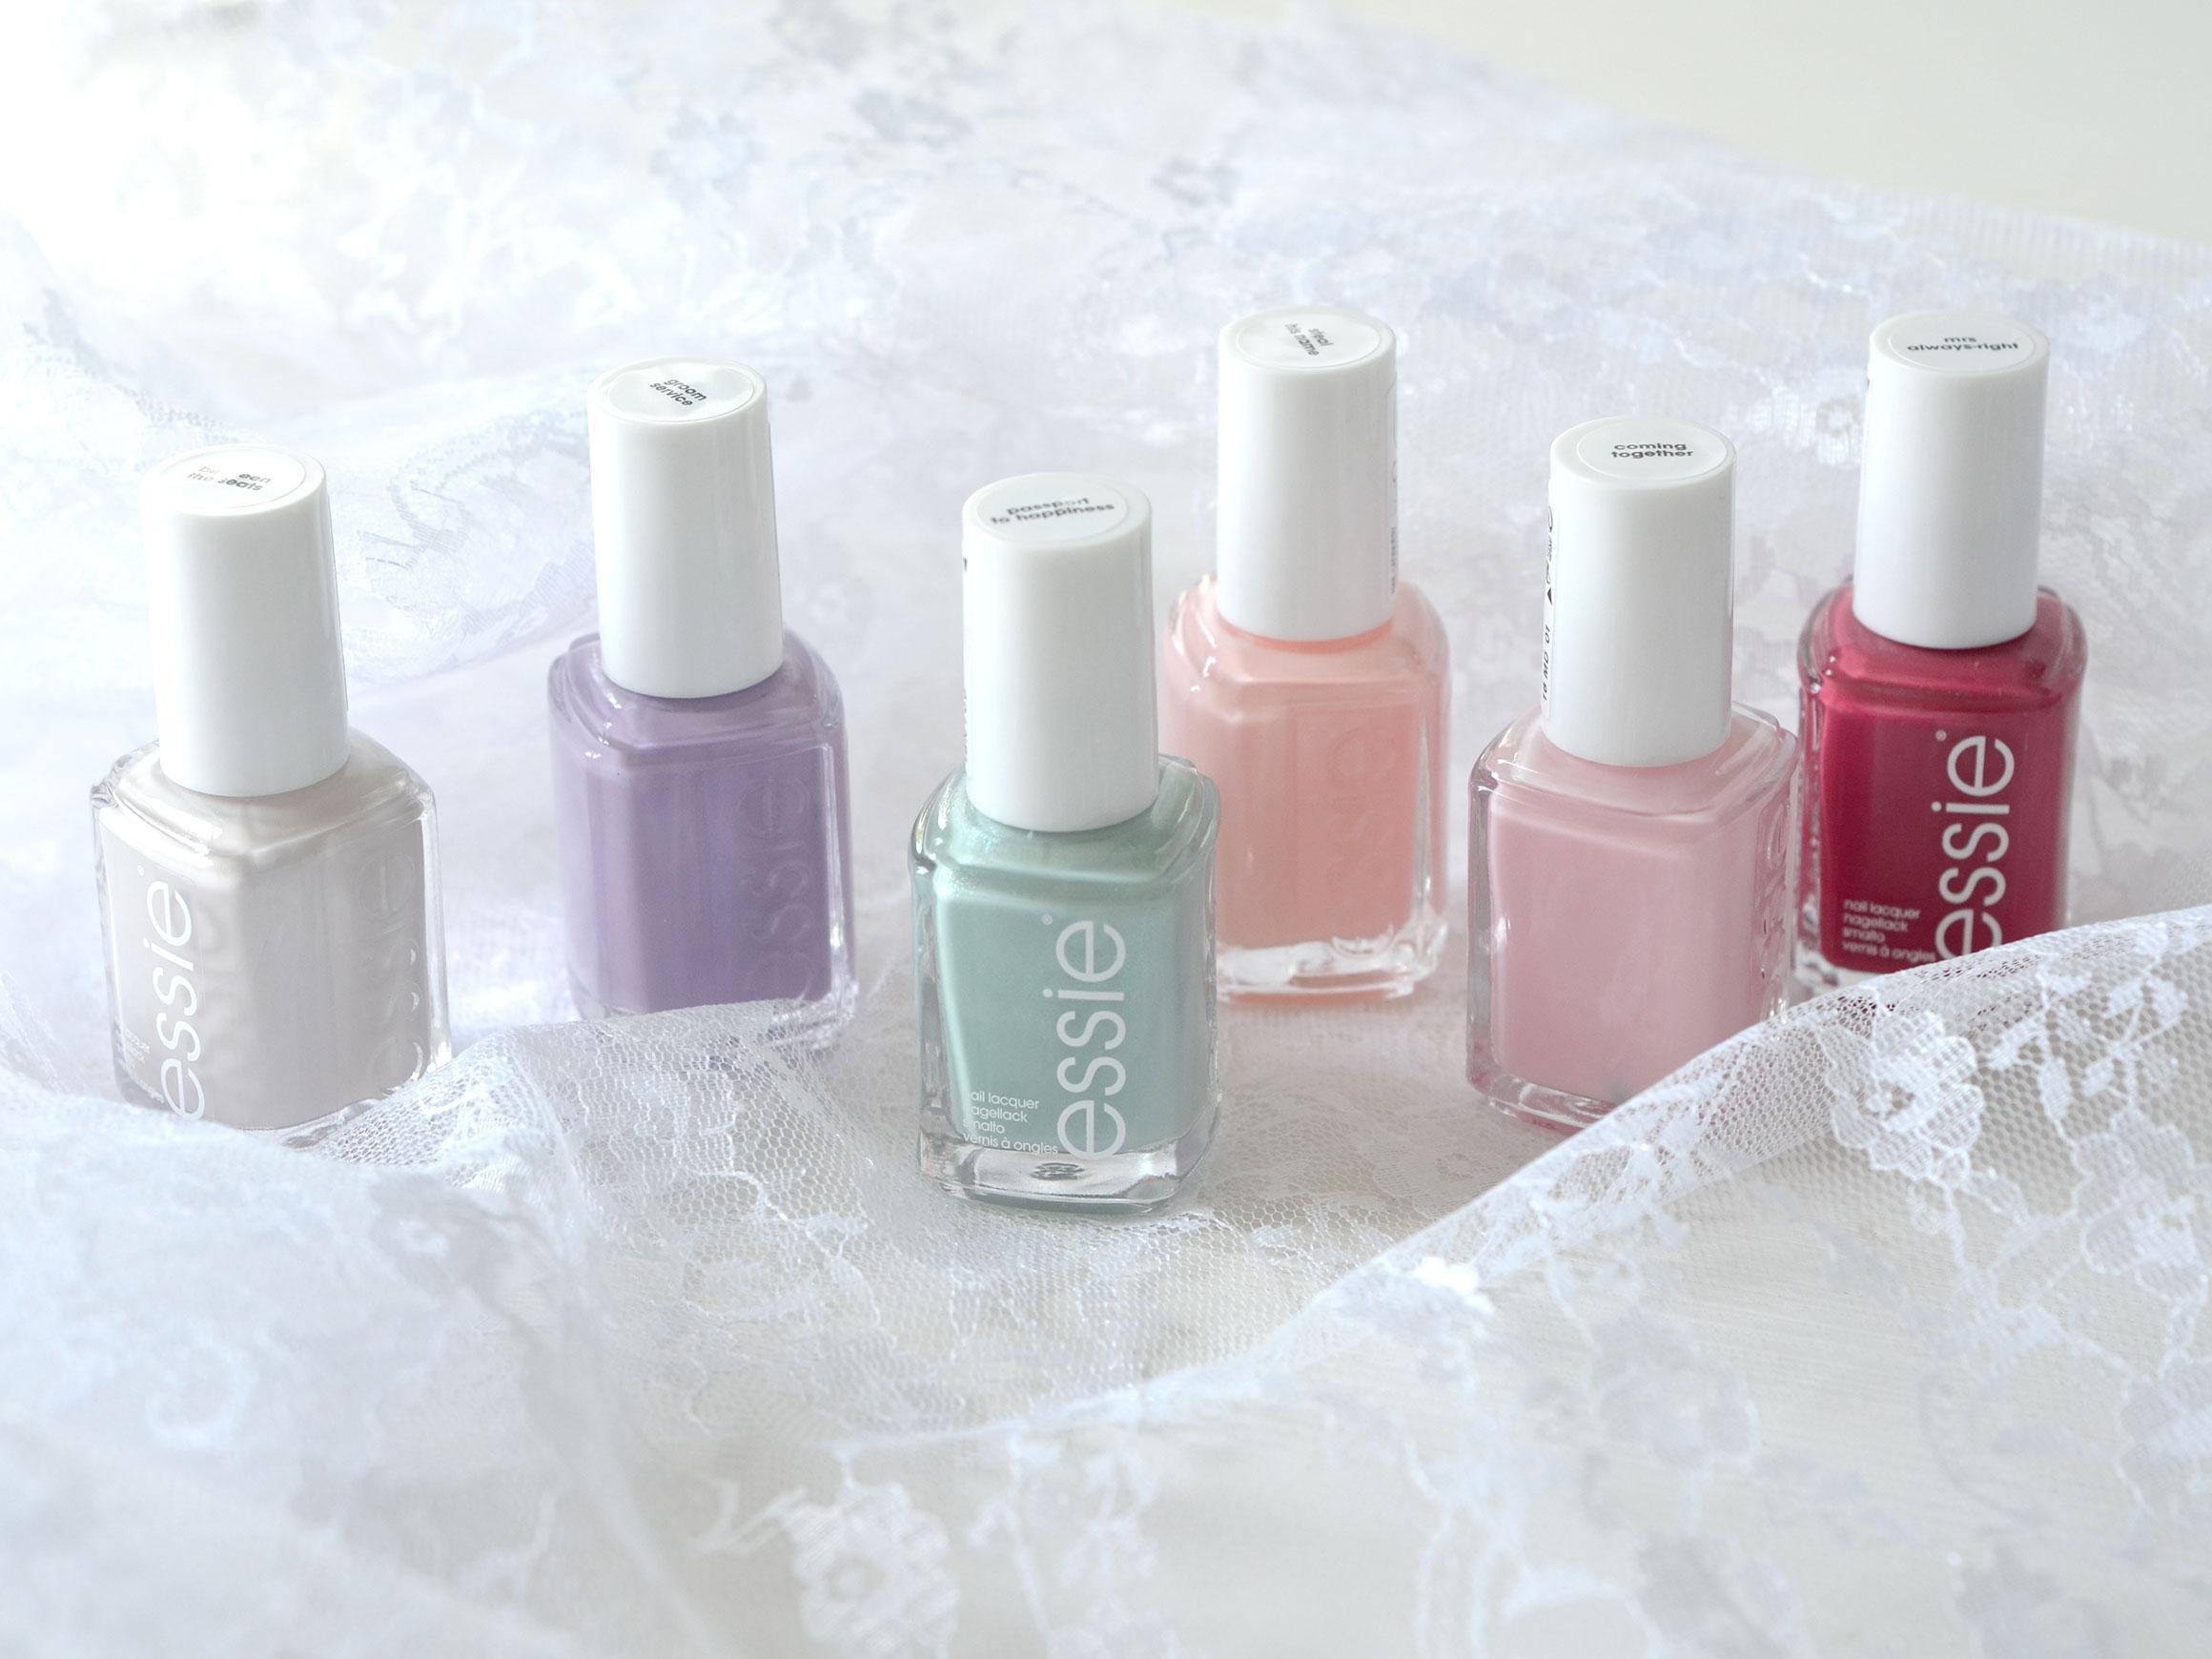 De lieve bridal collection van Essie